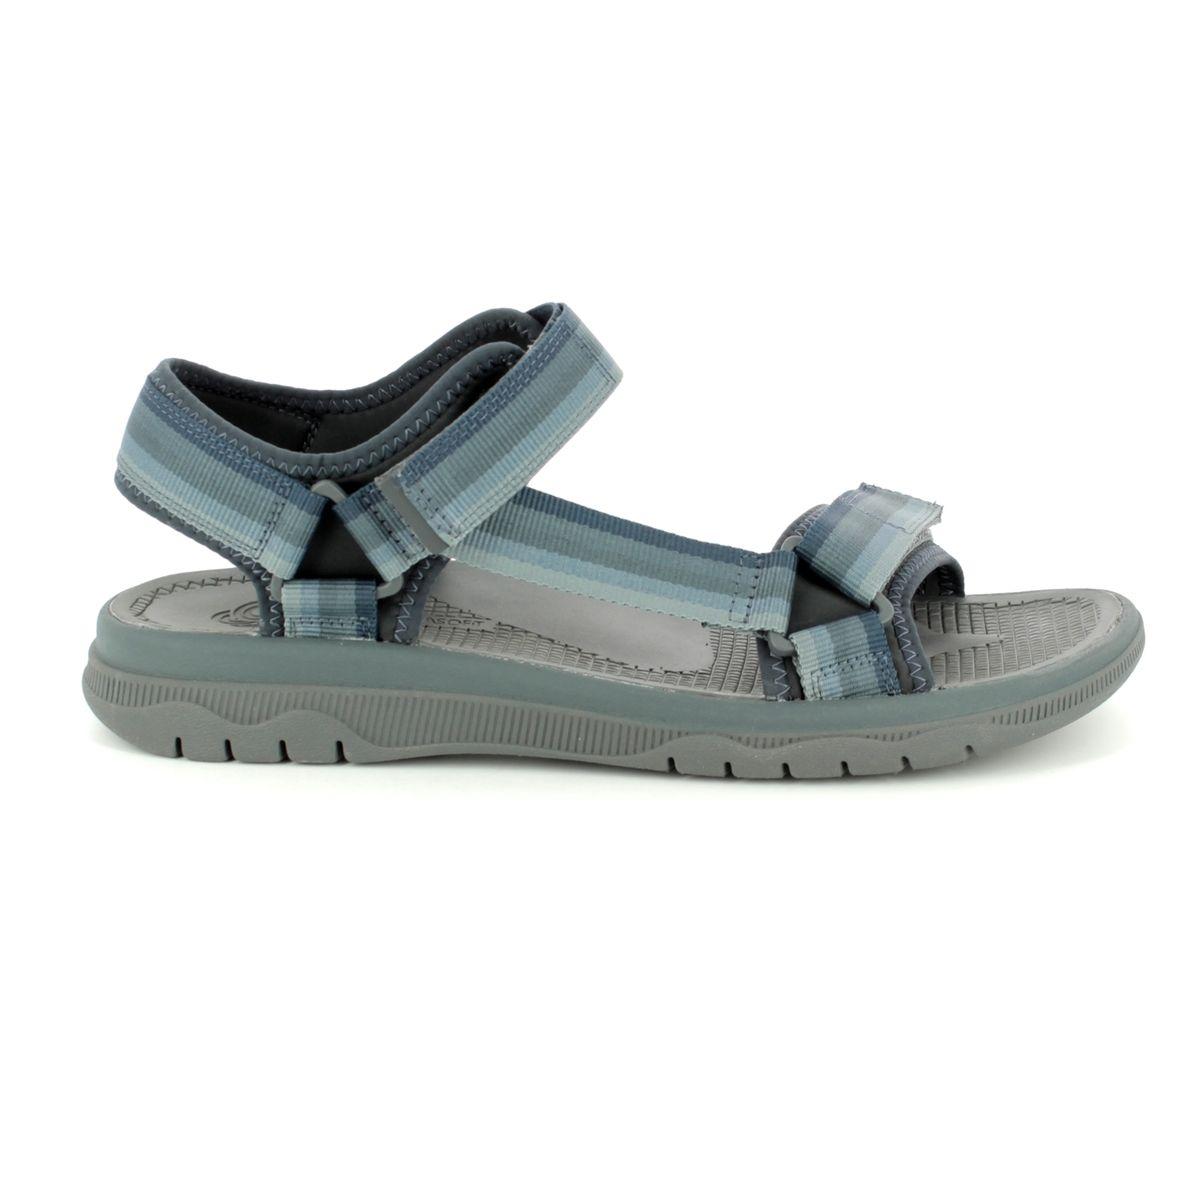 ac0ceec2d6048 Clarks Sandals - Grey - 3279 67G BALTA REEF